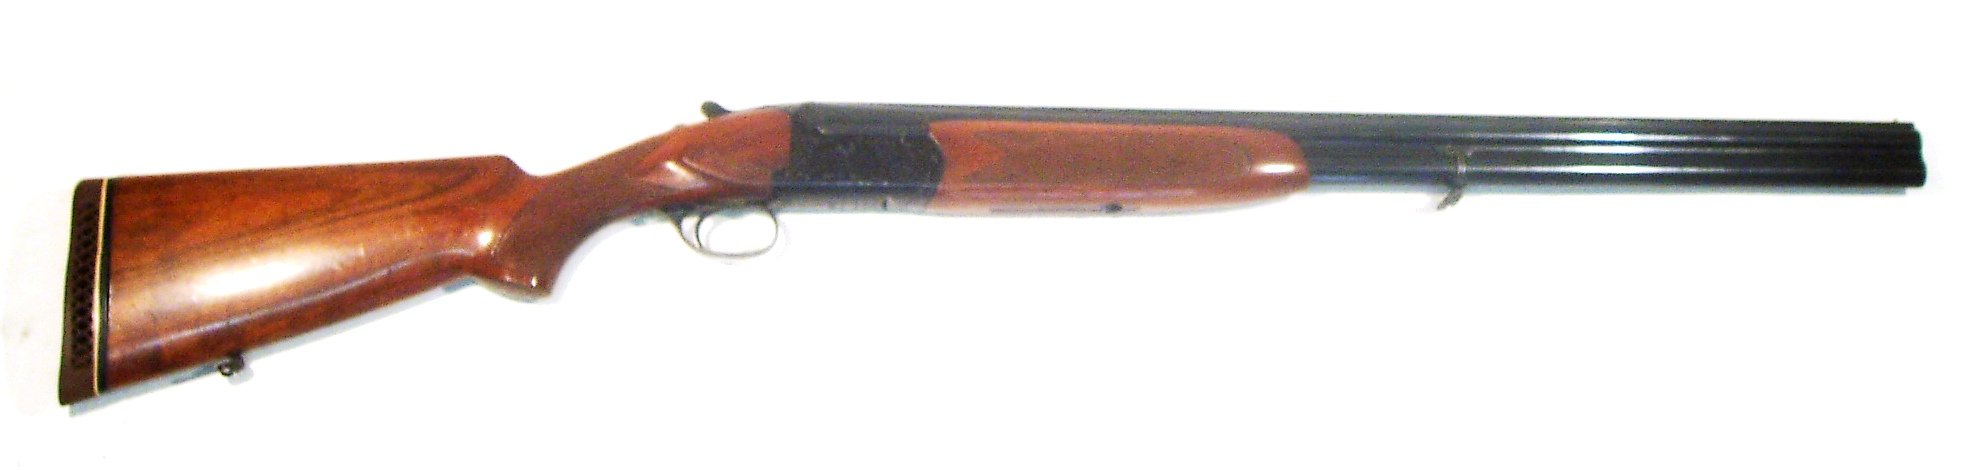 Escopeta FRANCHI modelo FALCONET